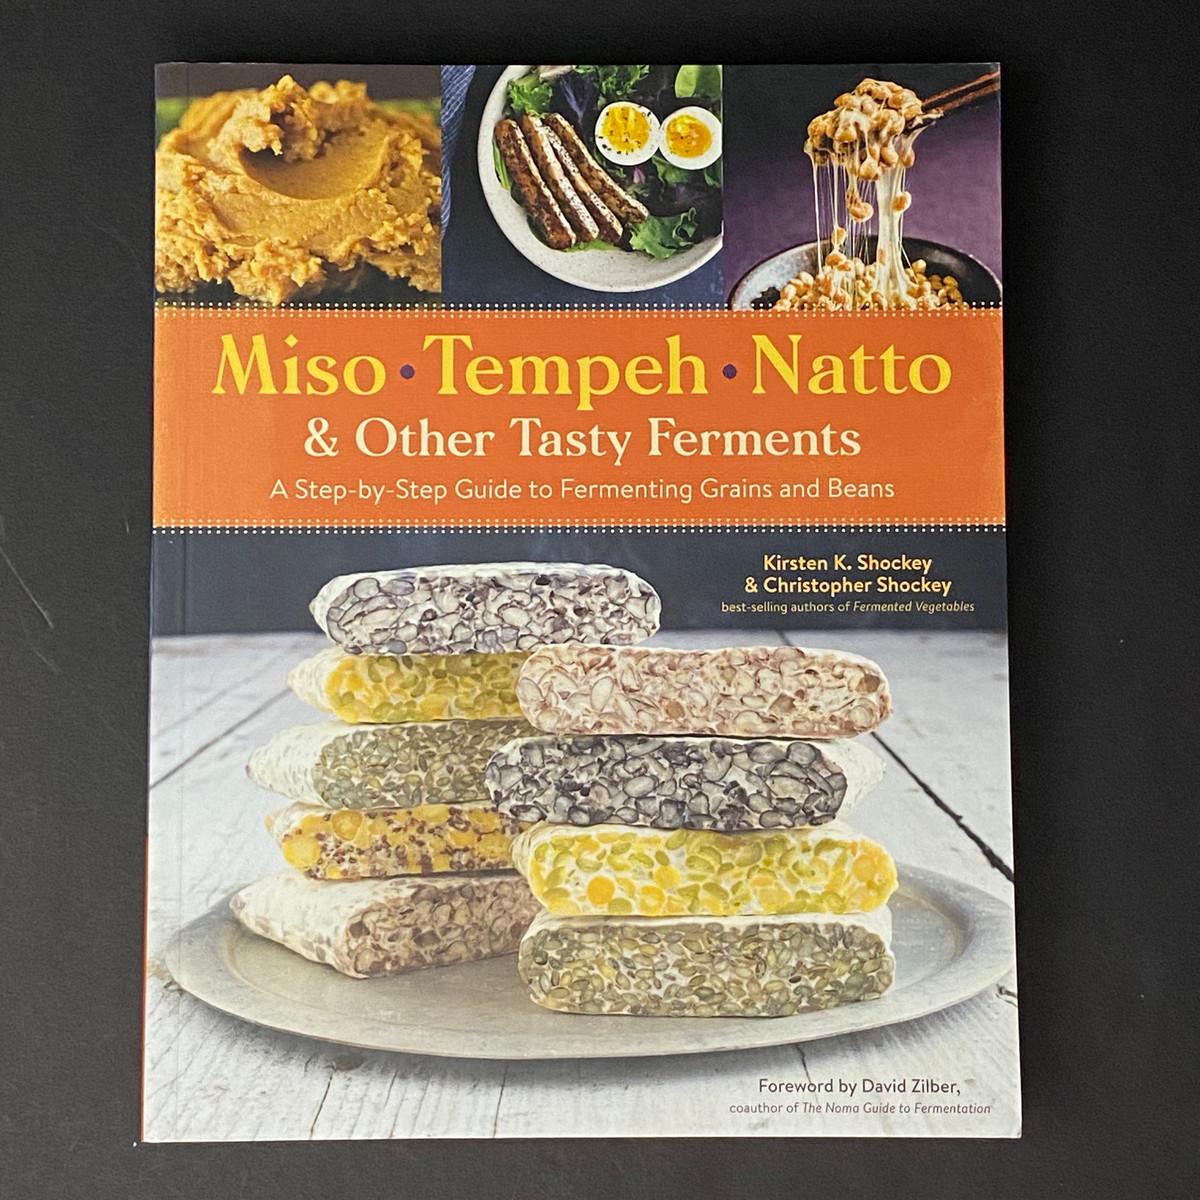 Miso, Tempeh, Natto | Kristen K. Shockey